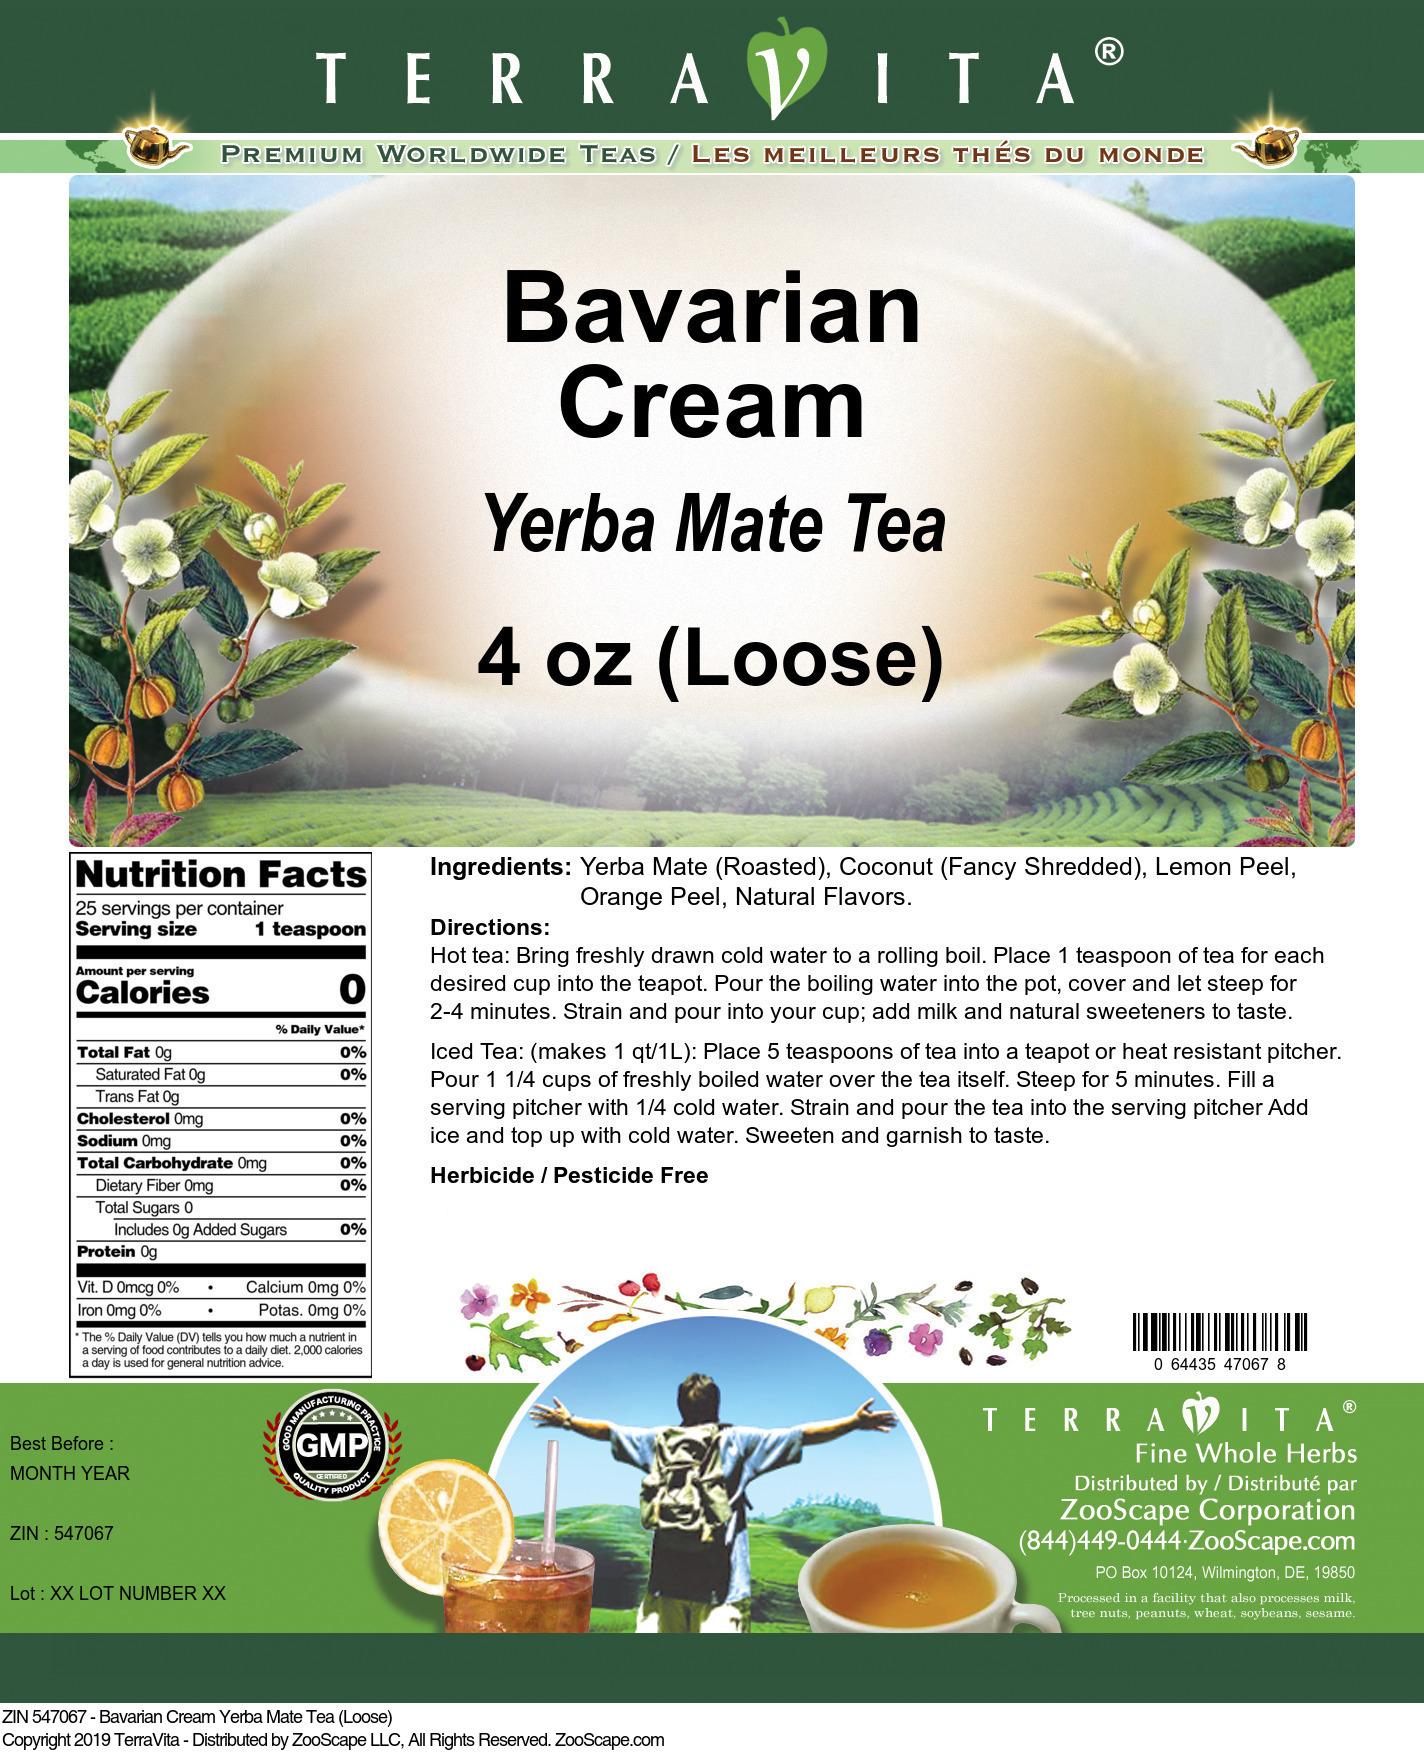 Bavarian Cream Yerba Mate Tea (Loose)